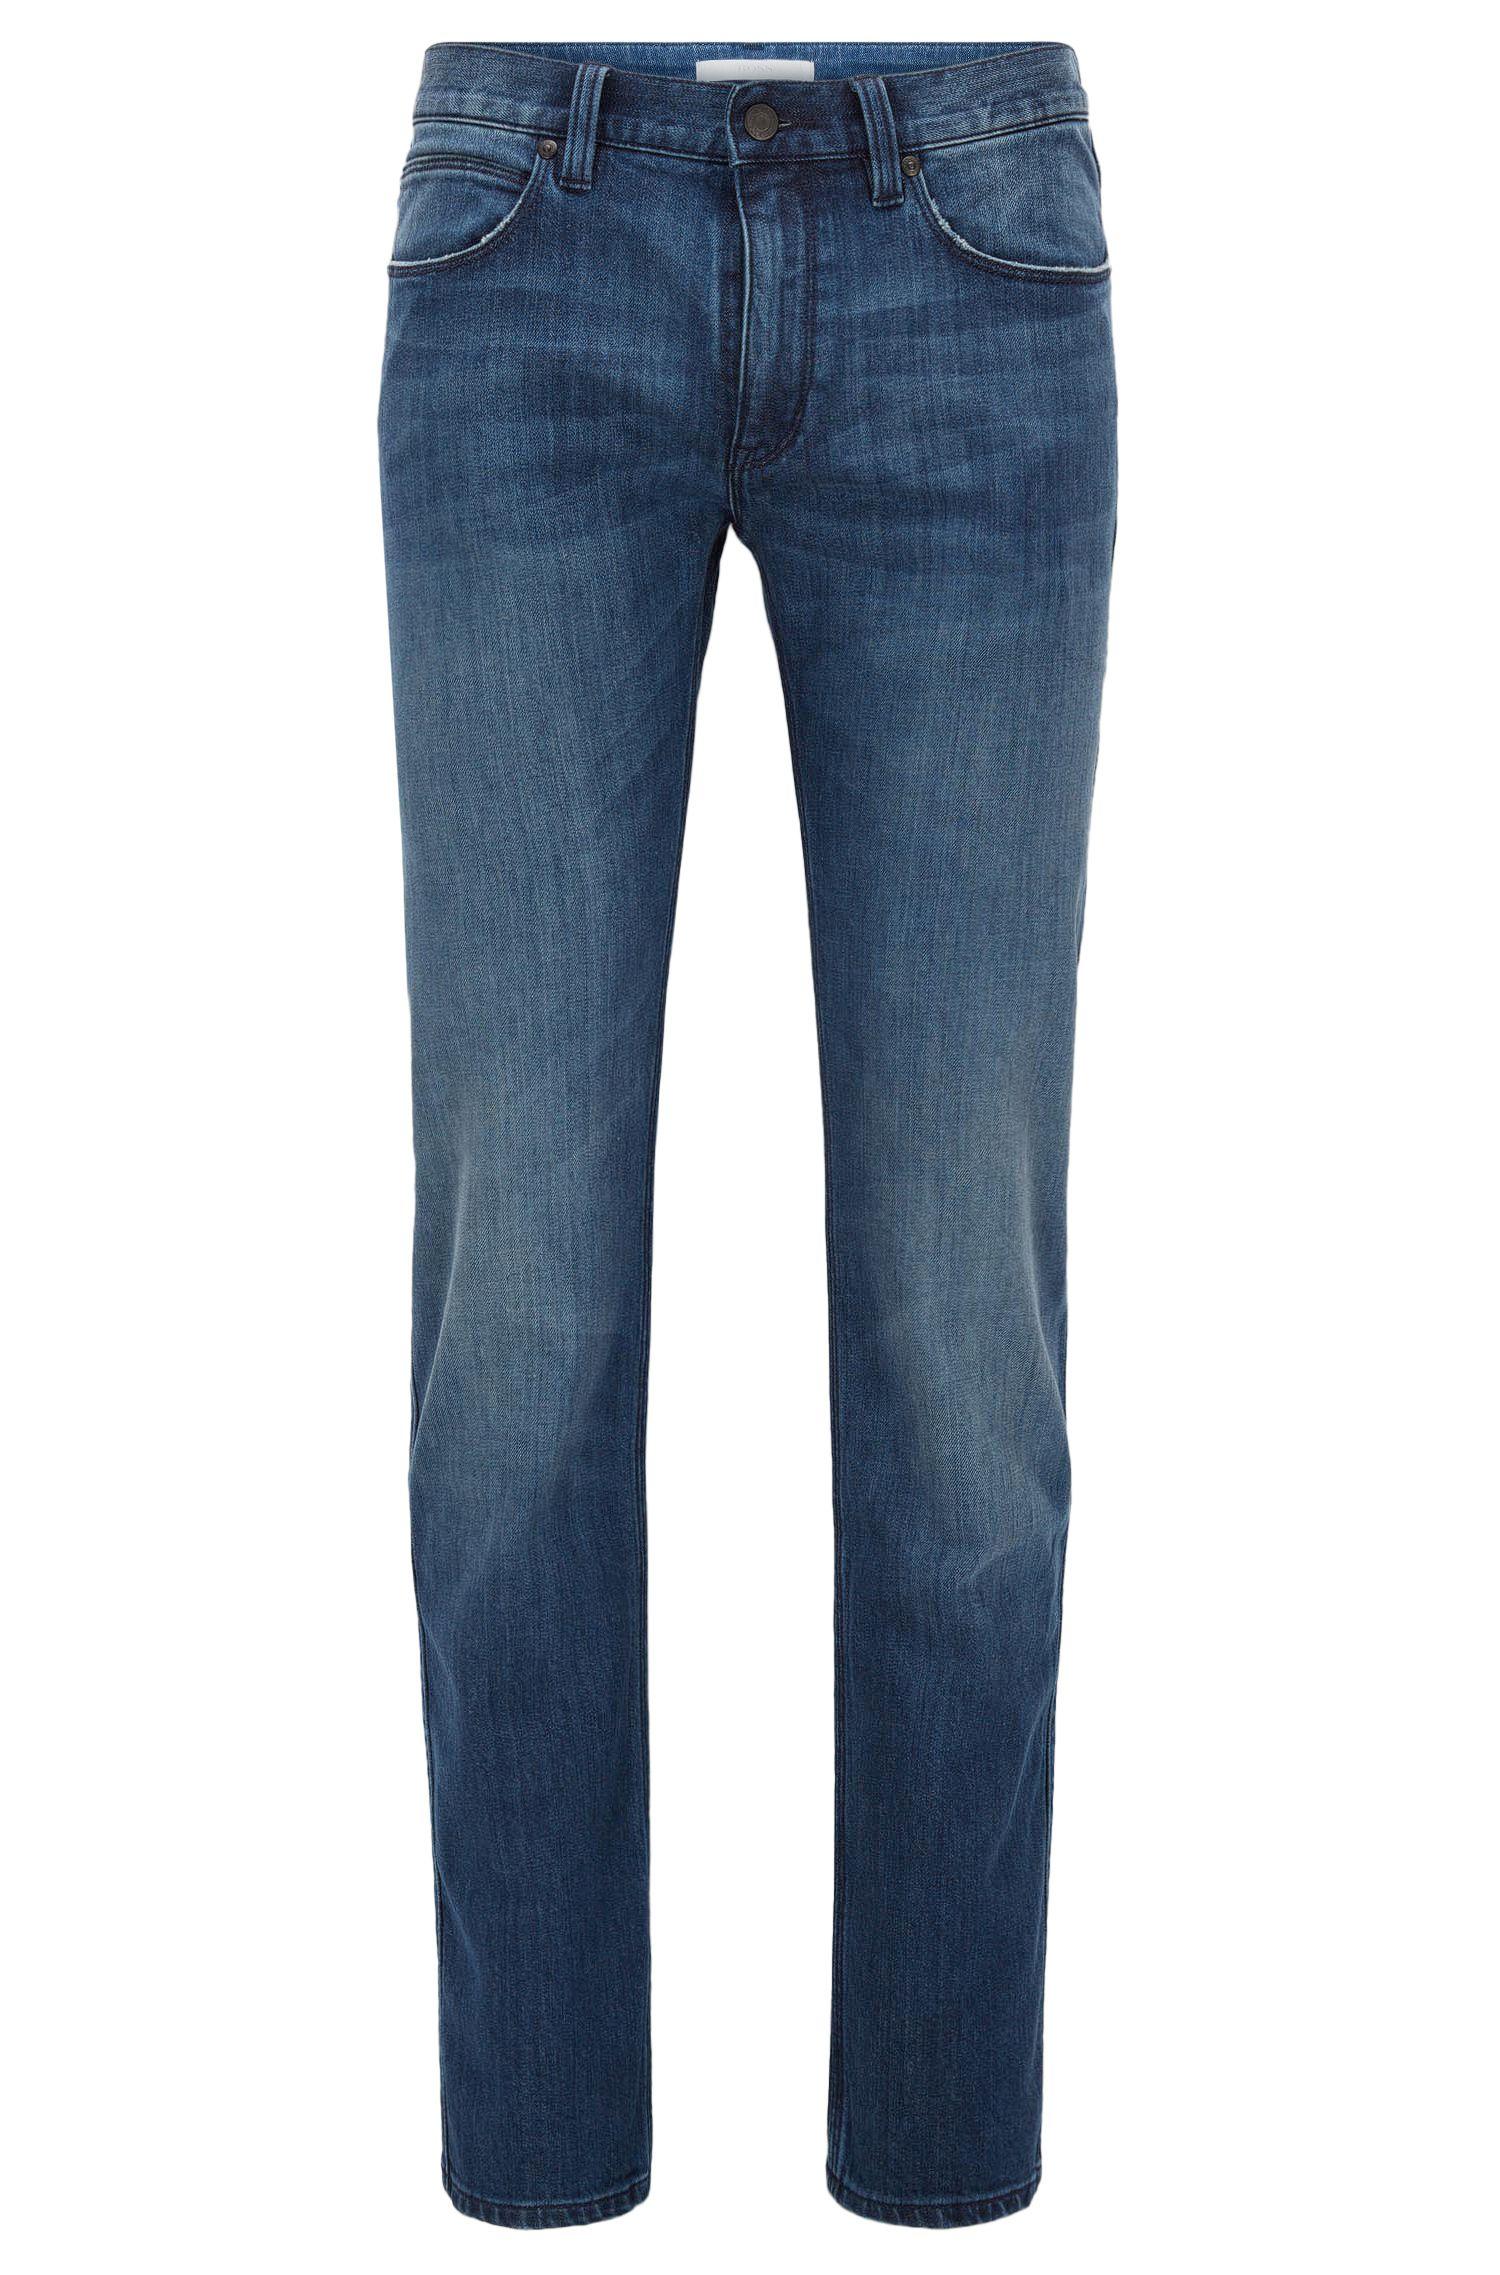 'HUGO 708'   Slim Fit, Stretch Cotton Blend Jeans